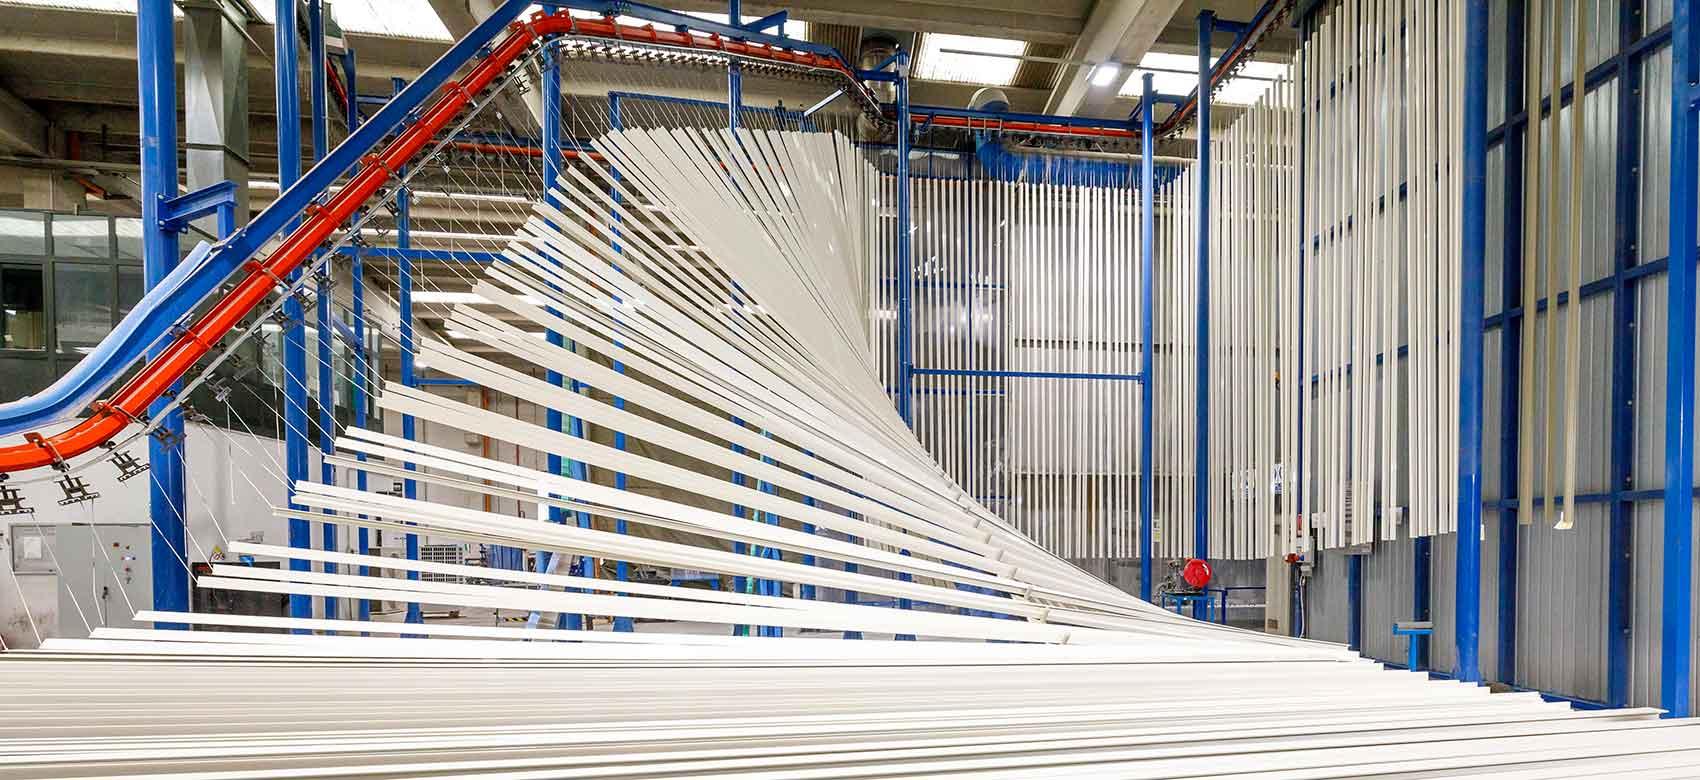 Kromoss Impianto Verniciatura Verticale Alluminio